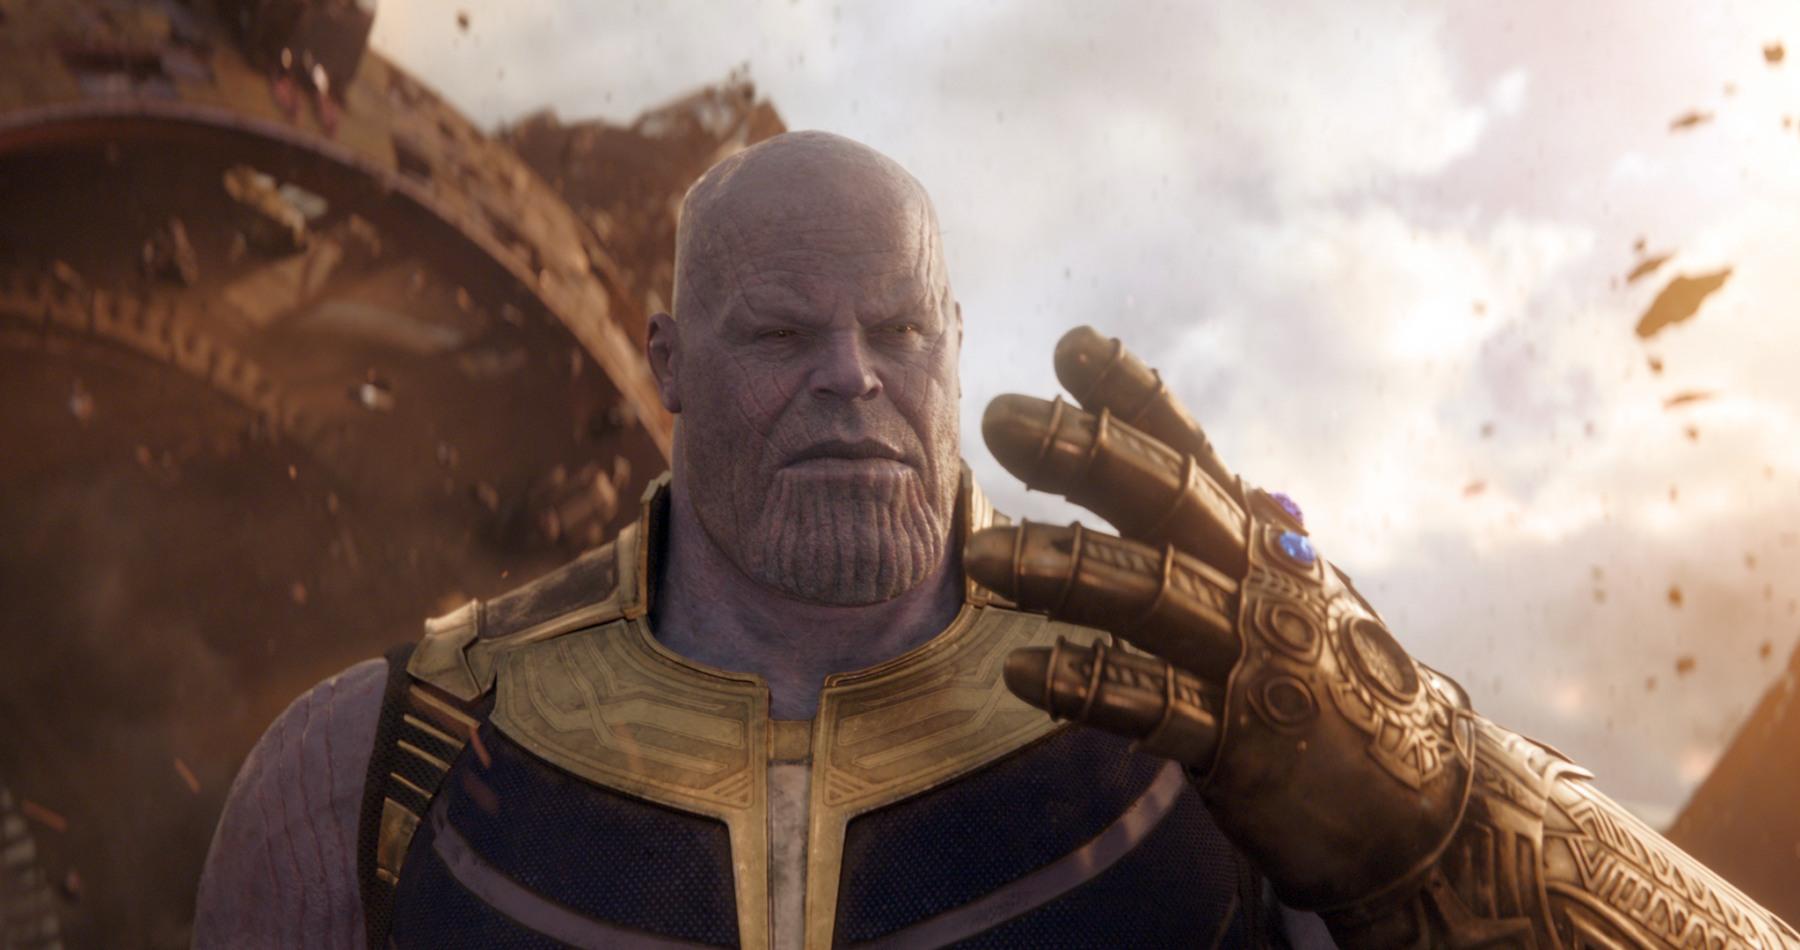 What we're watching: 'Avengers: Infinity War'